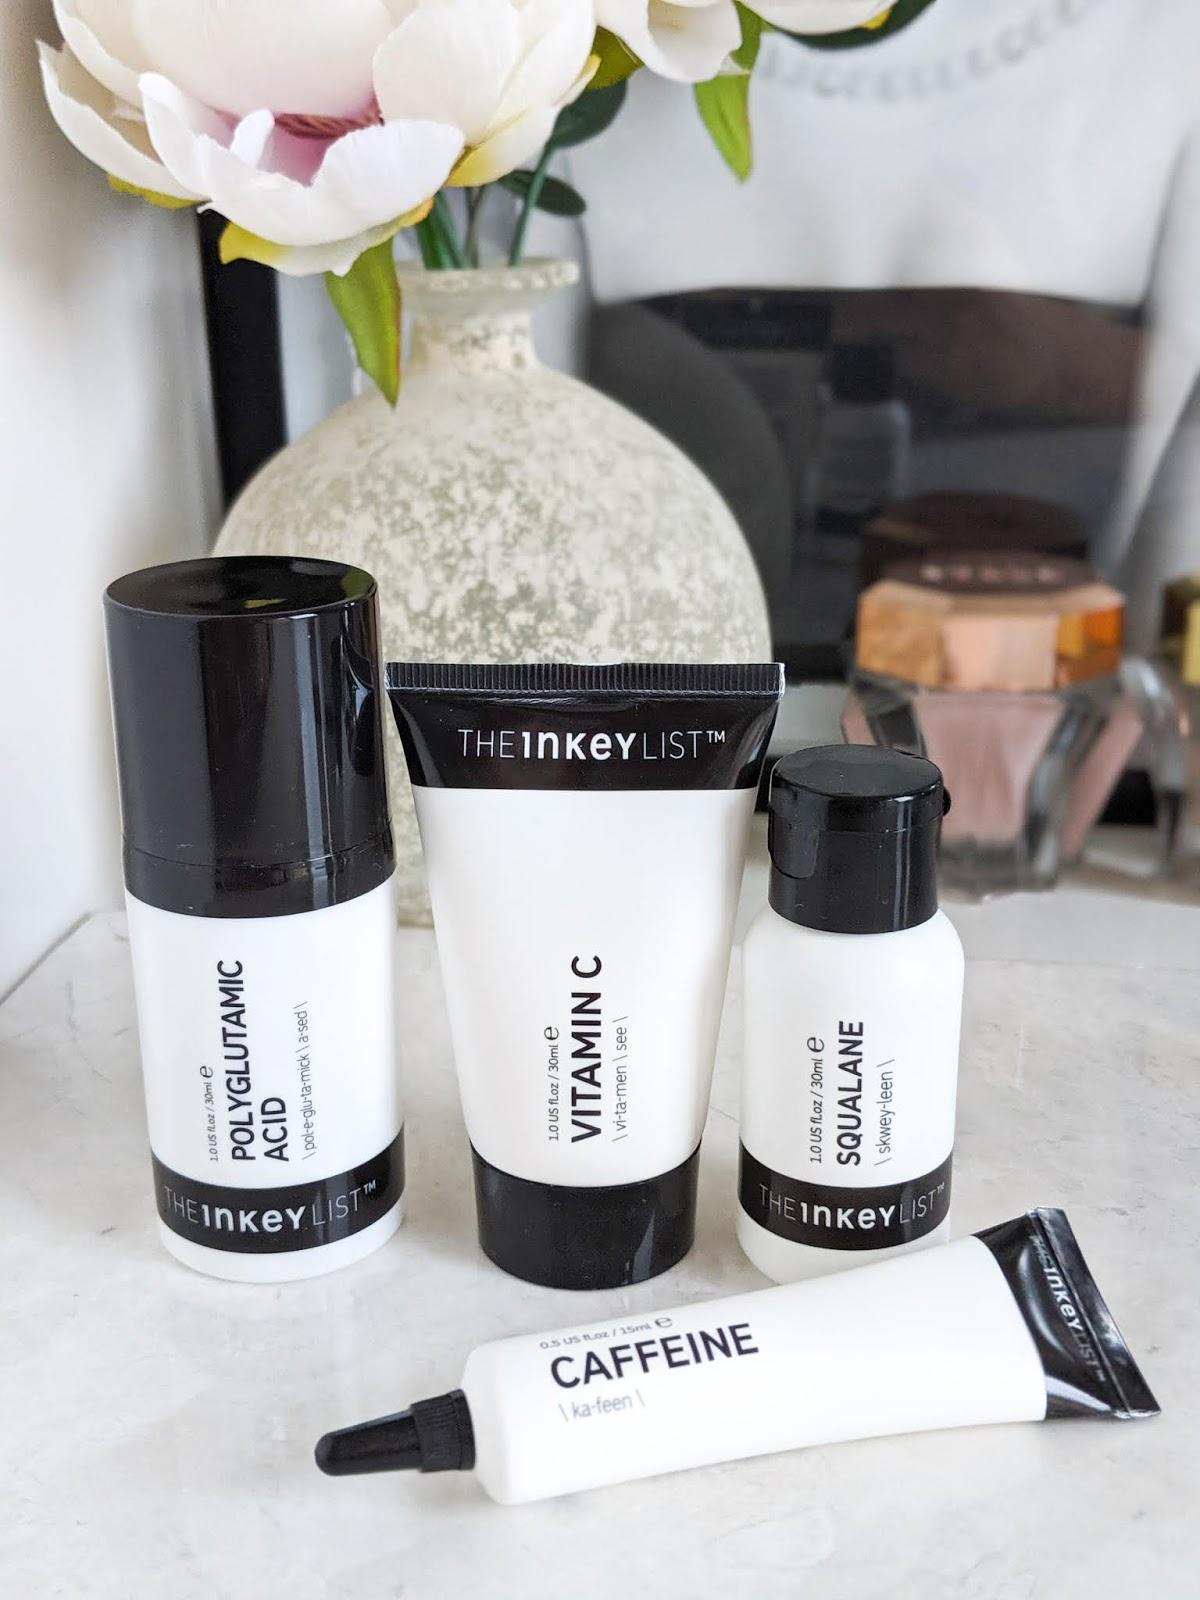 The_Inkey_List_Affordable_Skincare